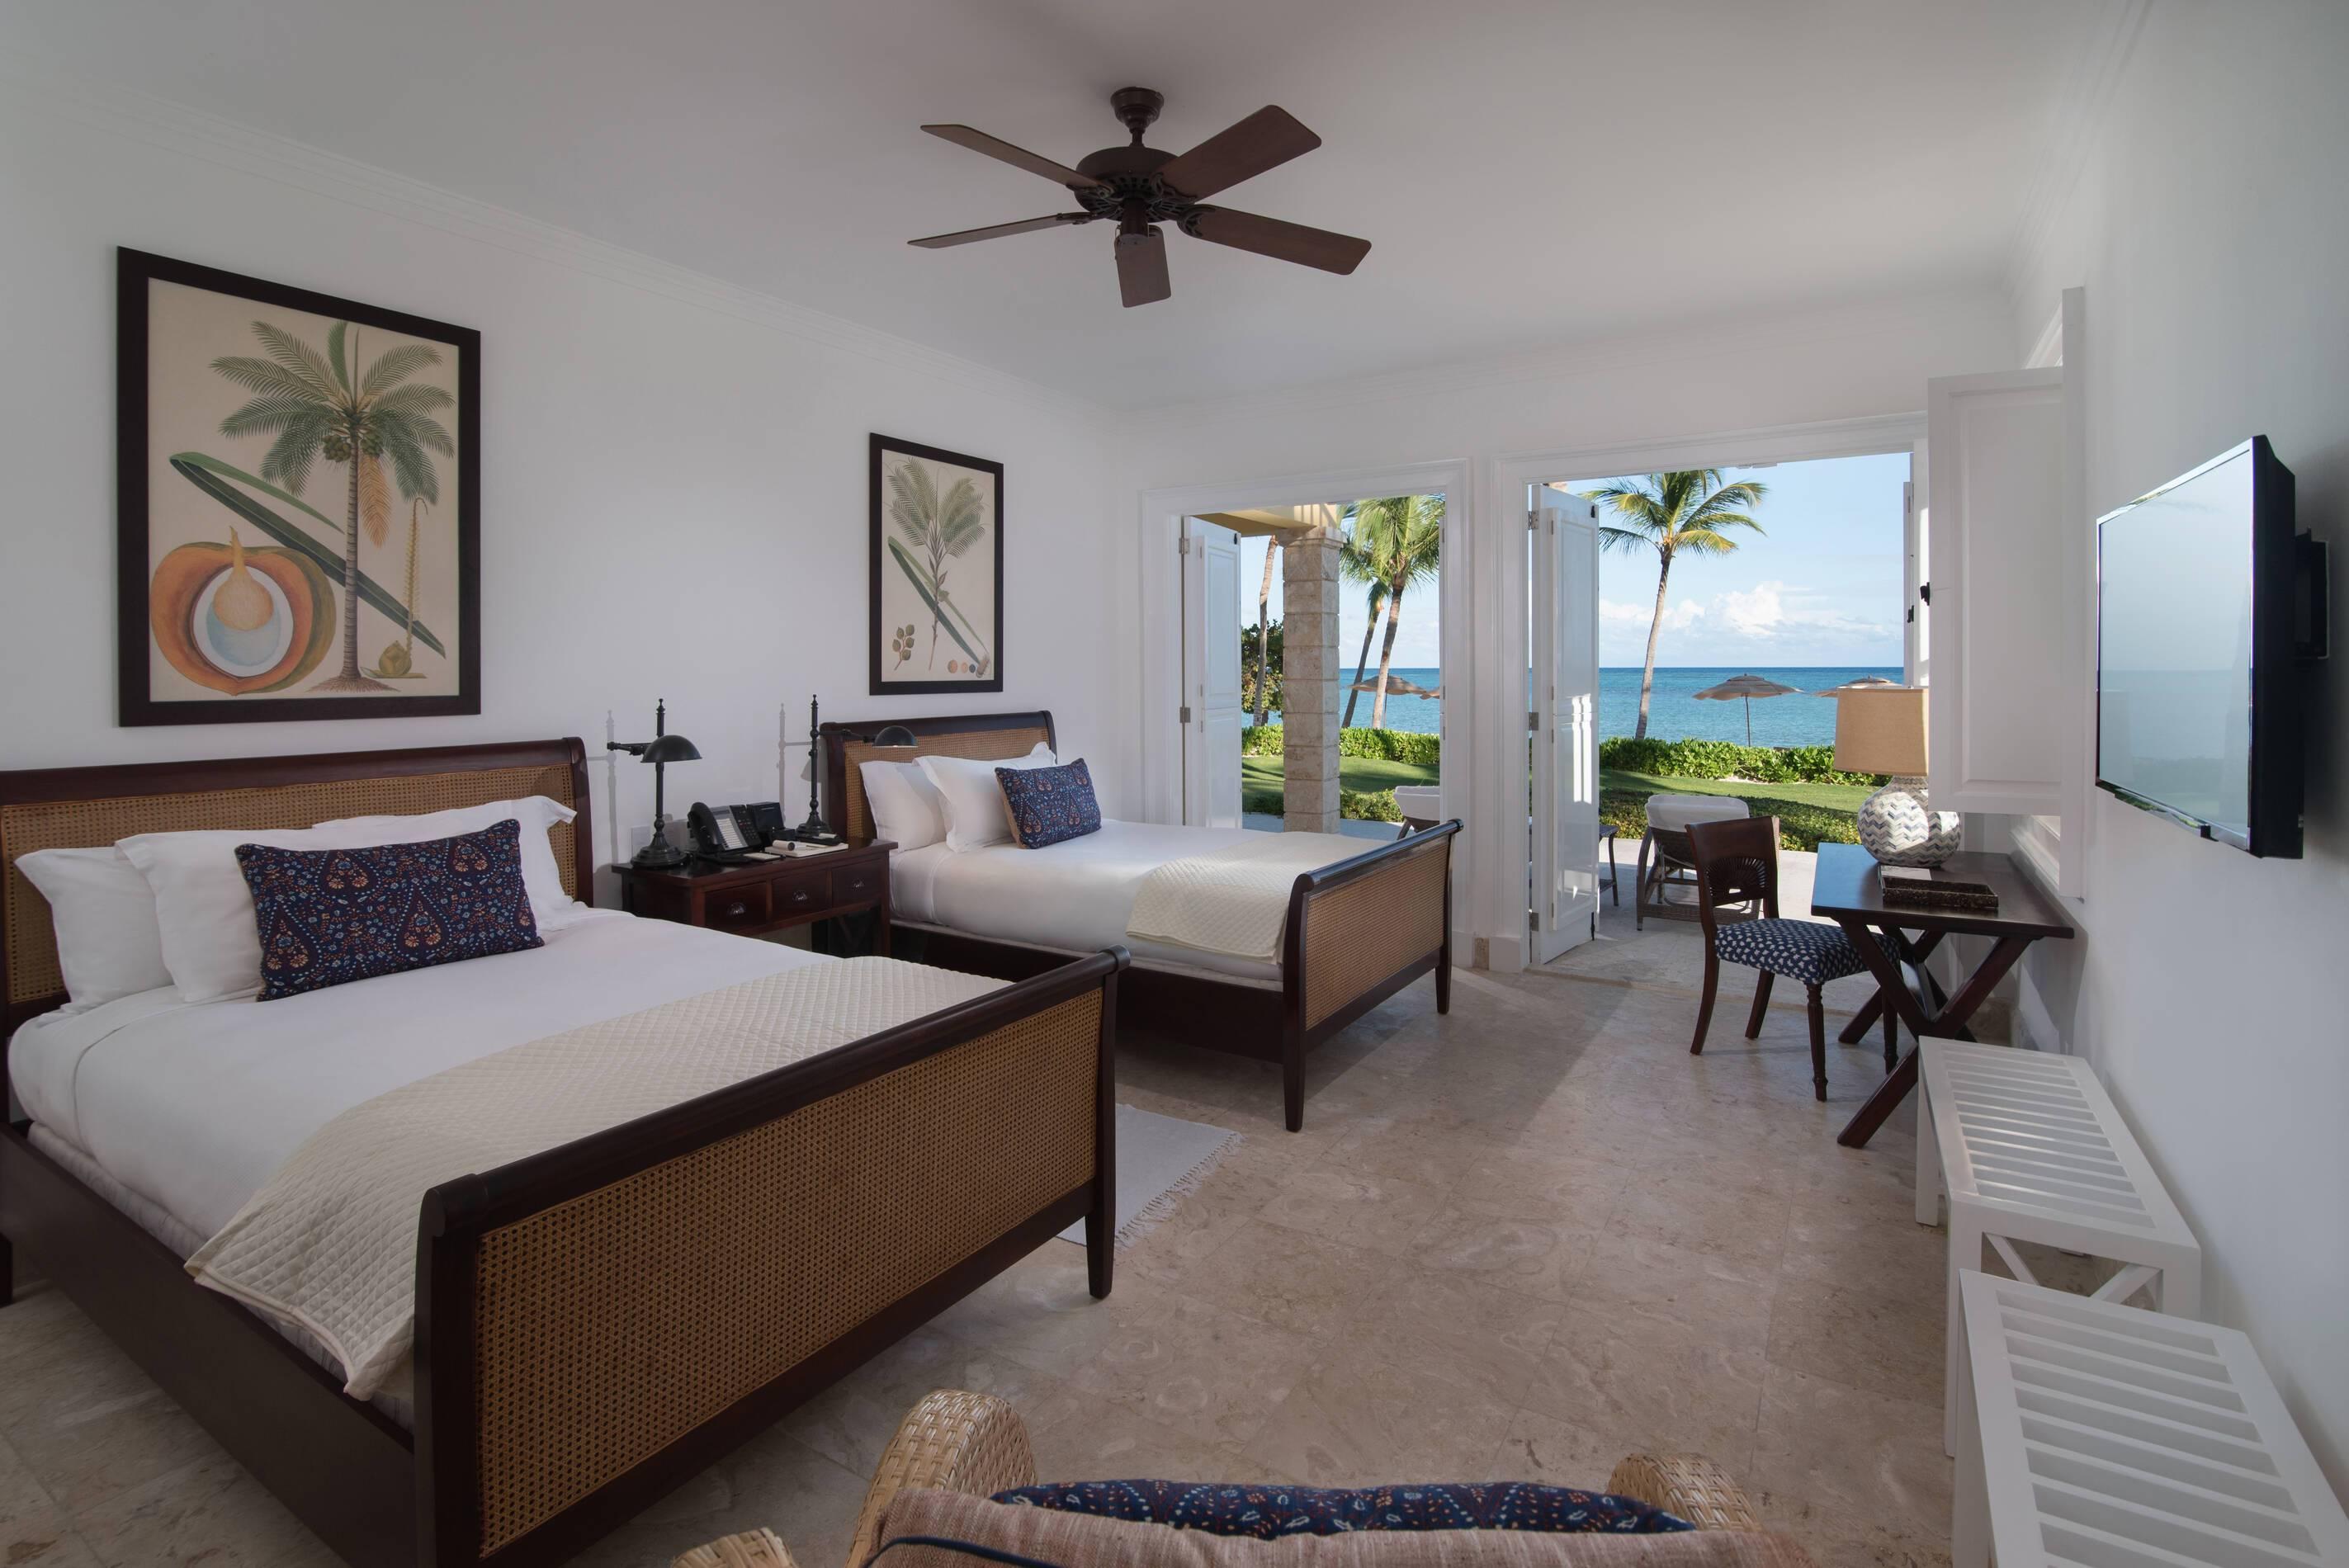 Tortuga Bay Ocean Front Full Beds Punta Cana